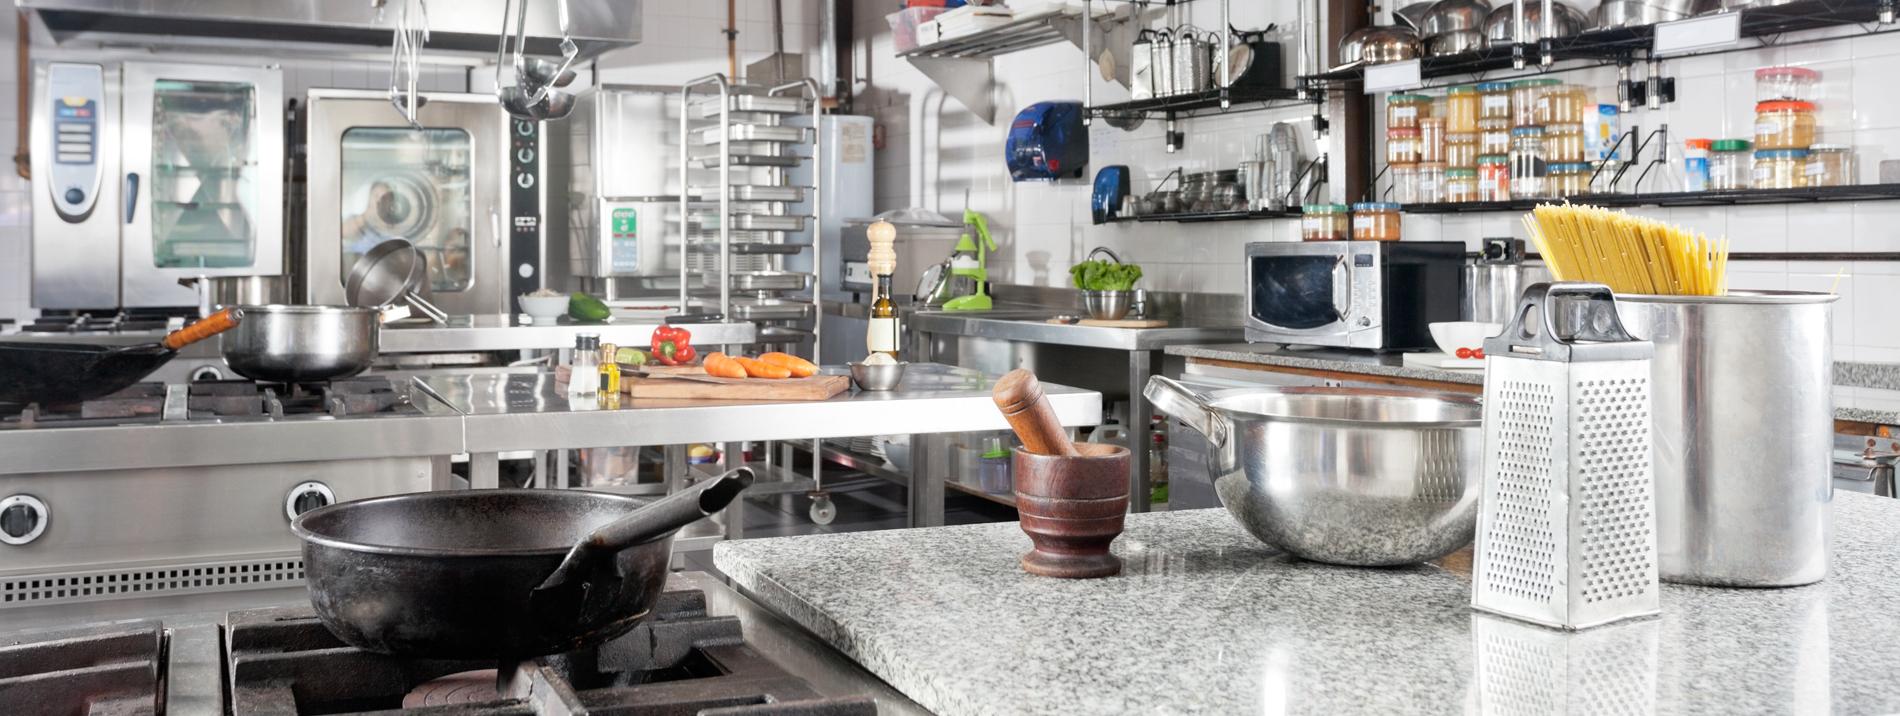 Nettoyer Une Hotte En Inox Planificateur De Cuisine